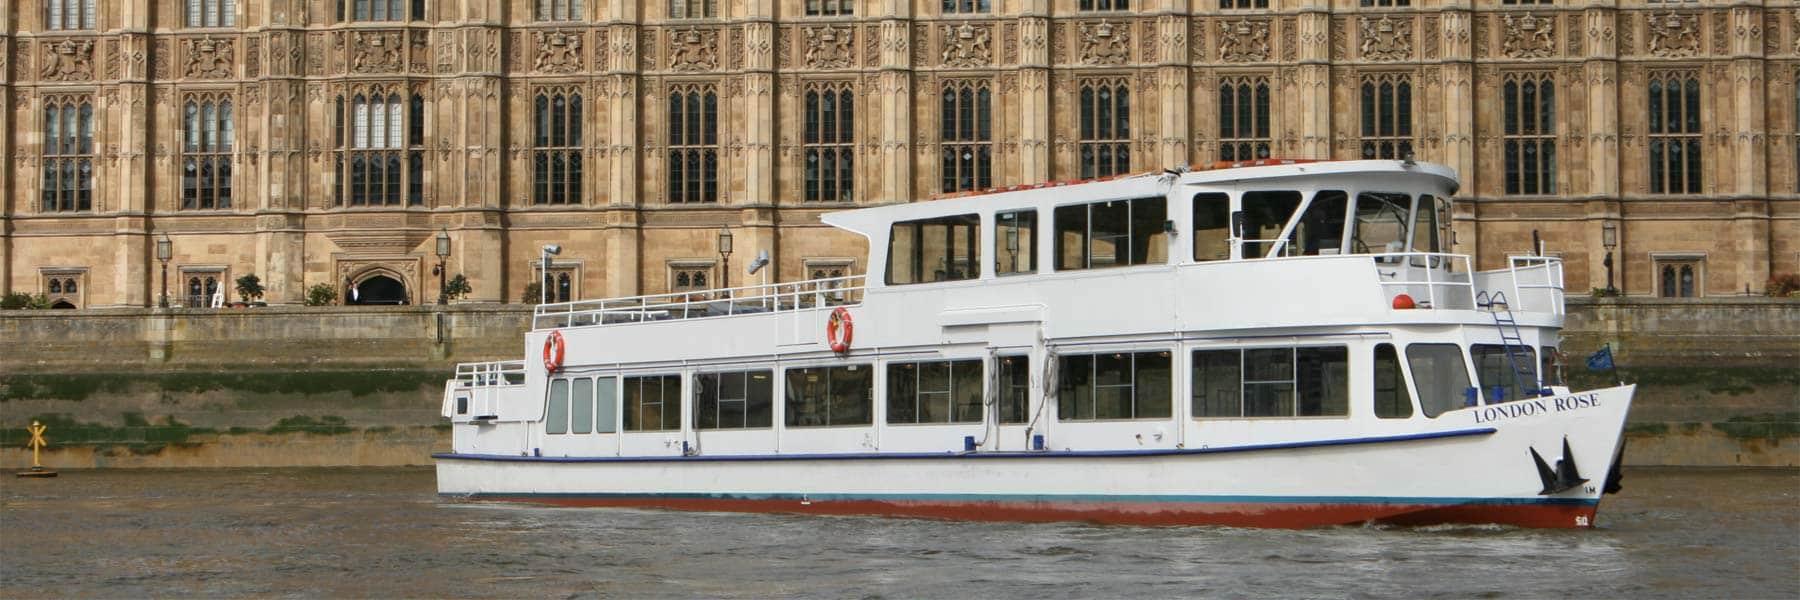 M.V London Rose